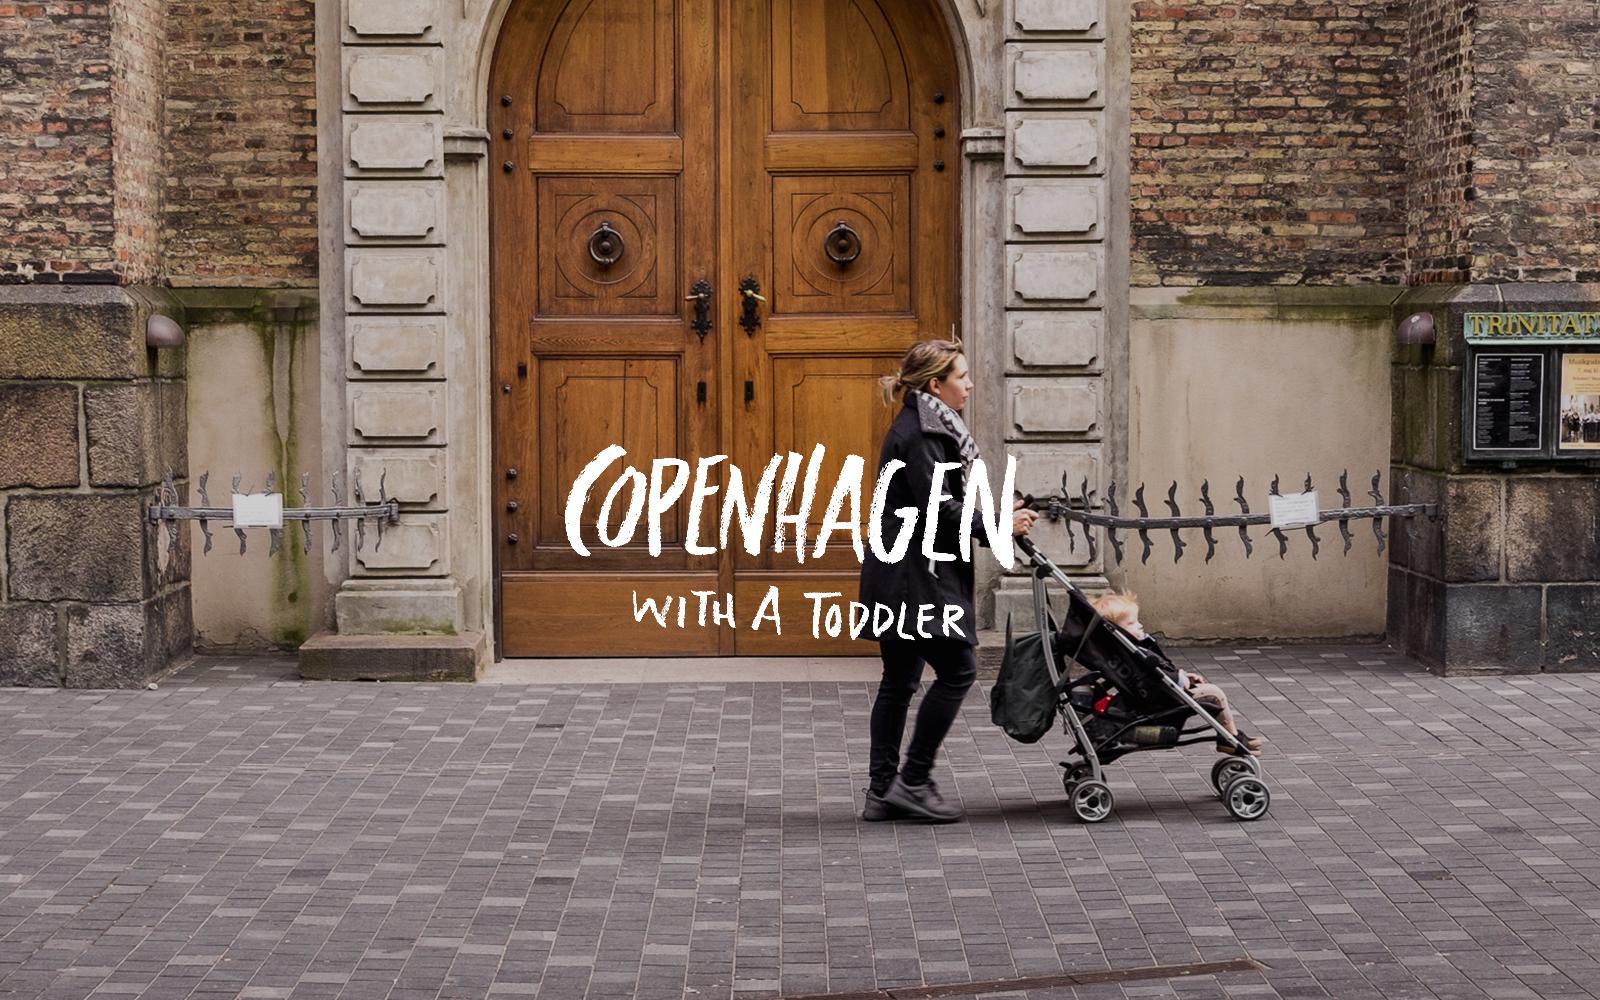 Traveling through Copenhagen, Denmark with a toddler. A City Guide of Copenhagen on The Fresh Exchange